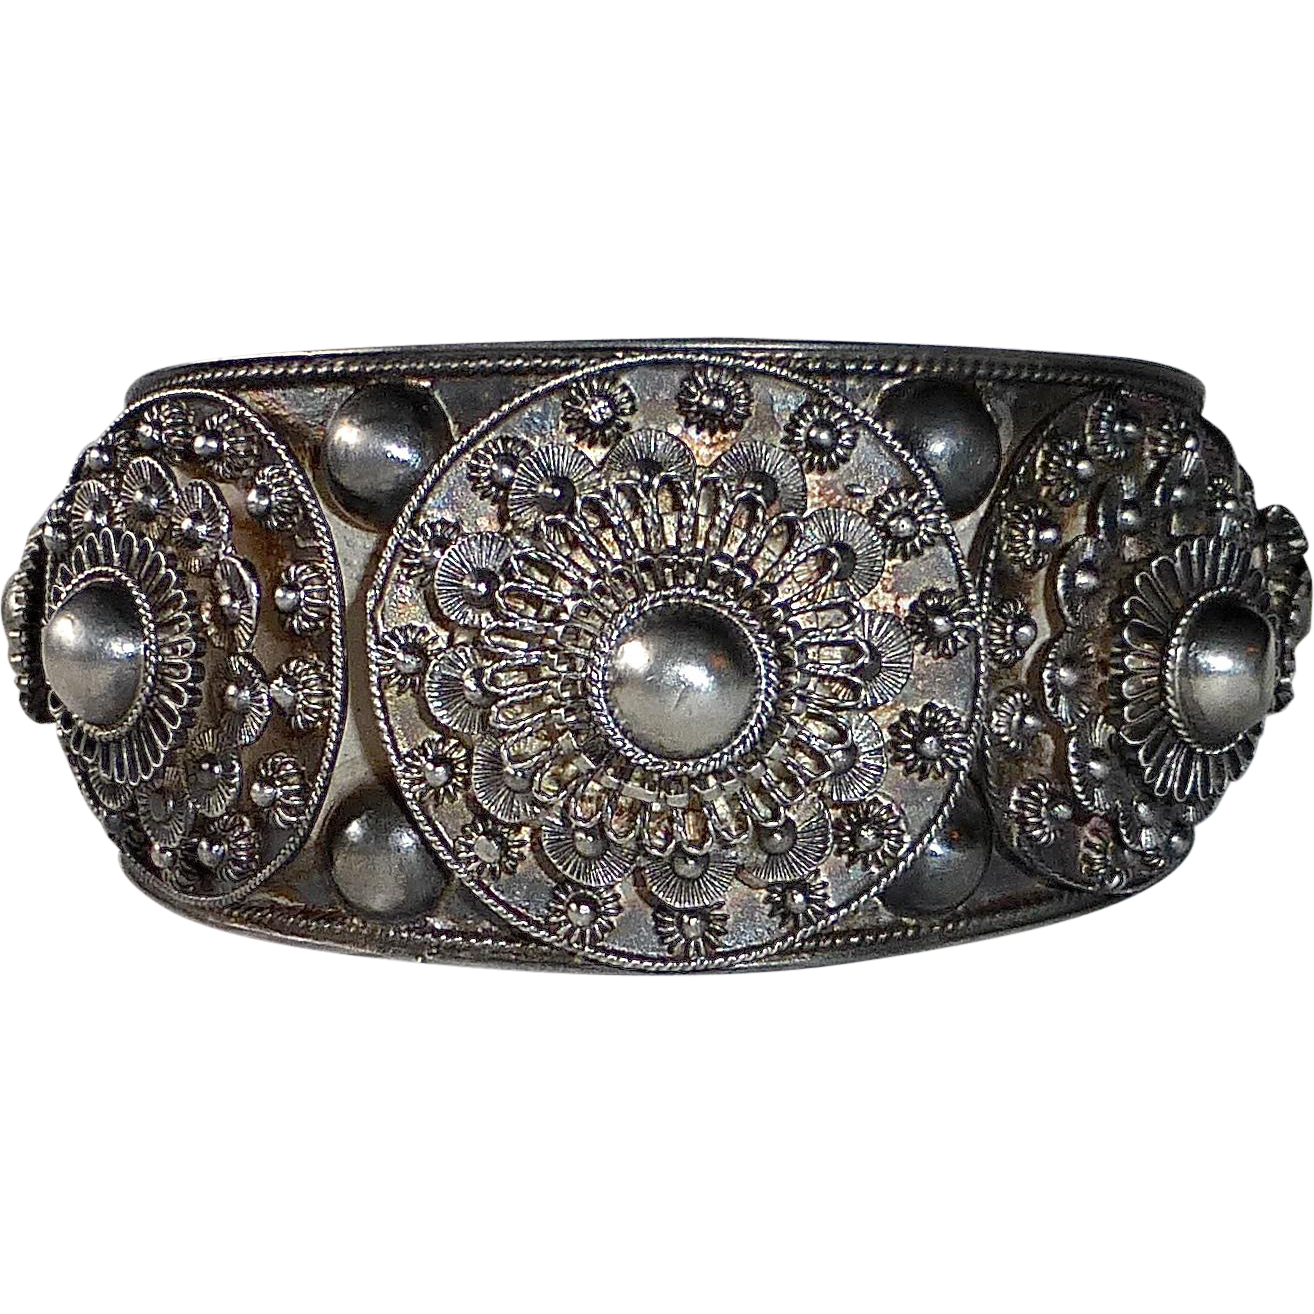 Ornate Silver Cannetille Filigree Cuff Bracelet